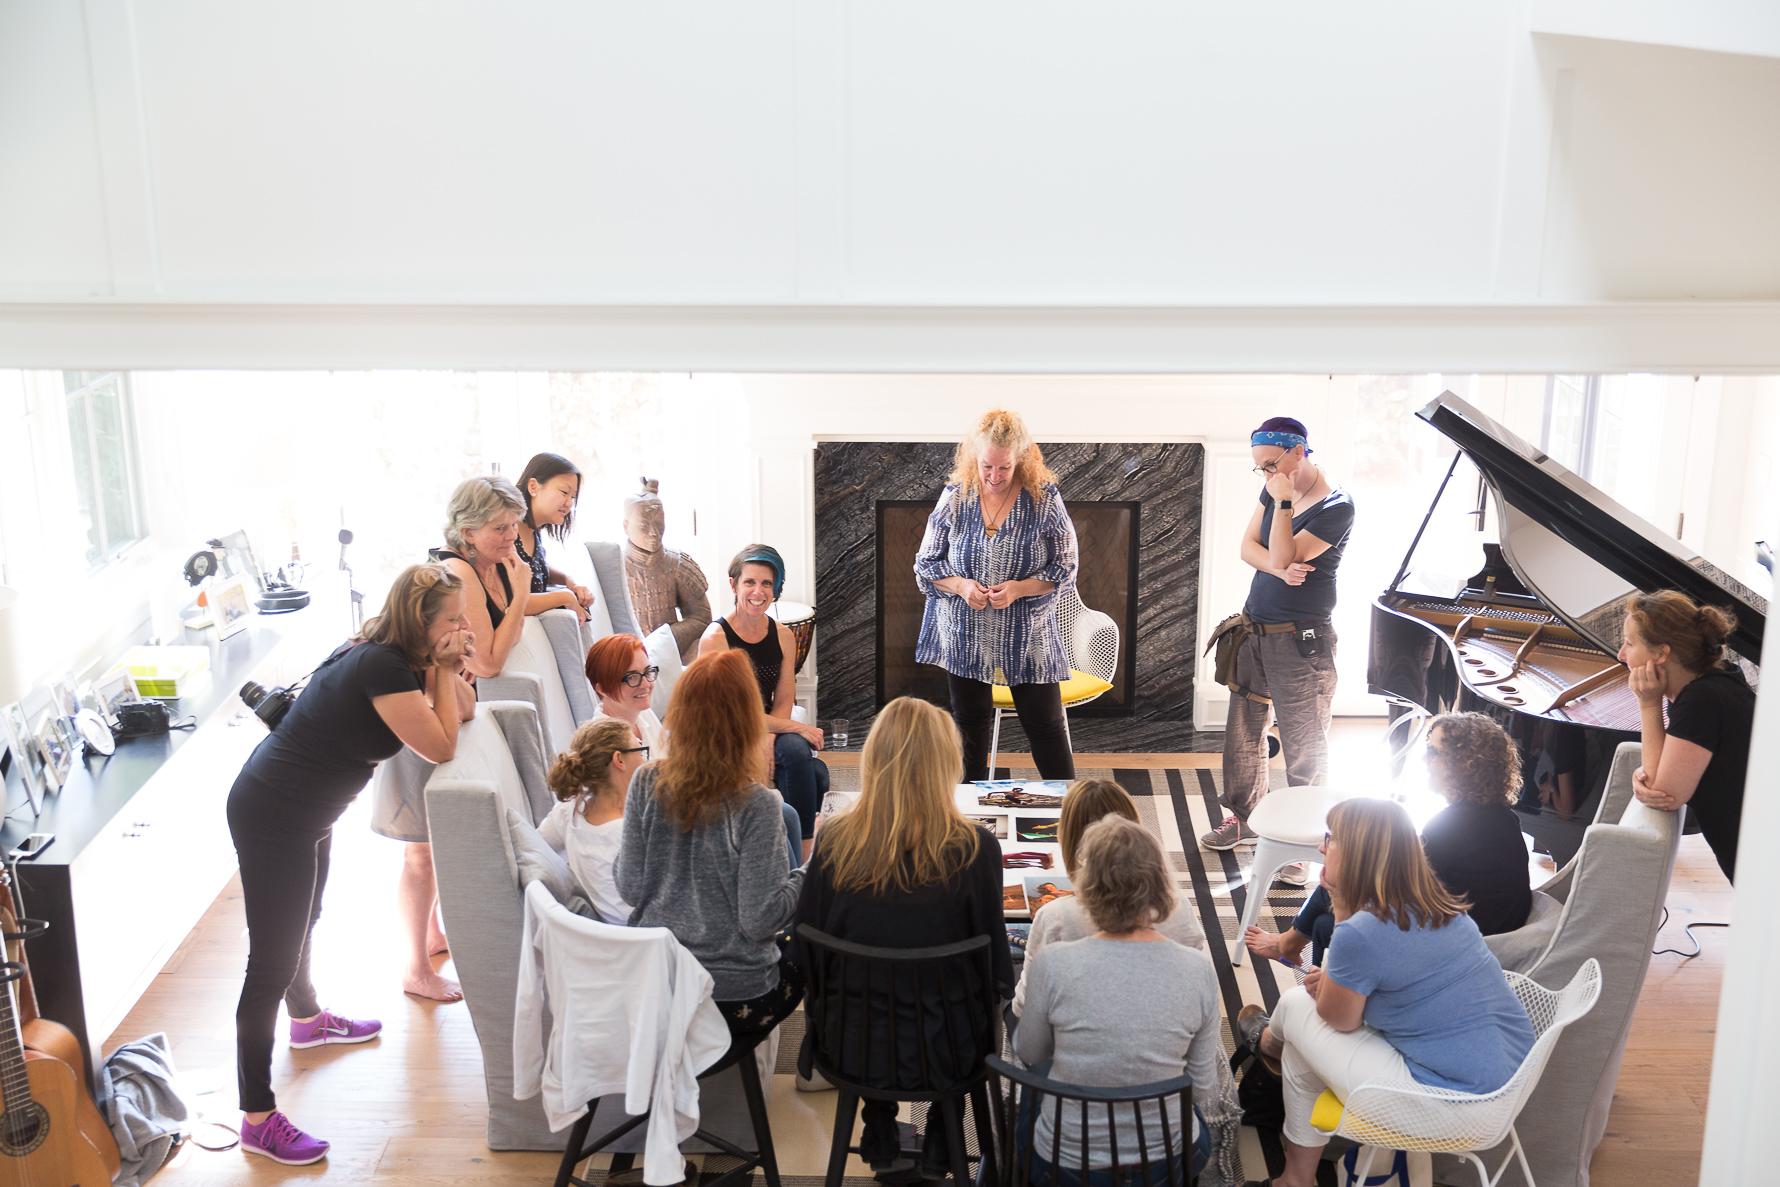 photography workshop for creative women san francisco bay area | firefly institute | suzanneobrienstudio.com